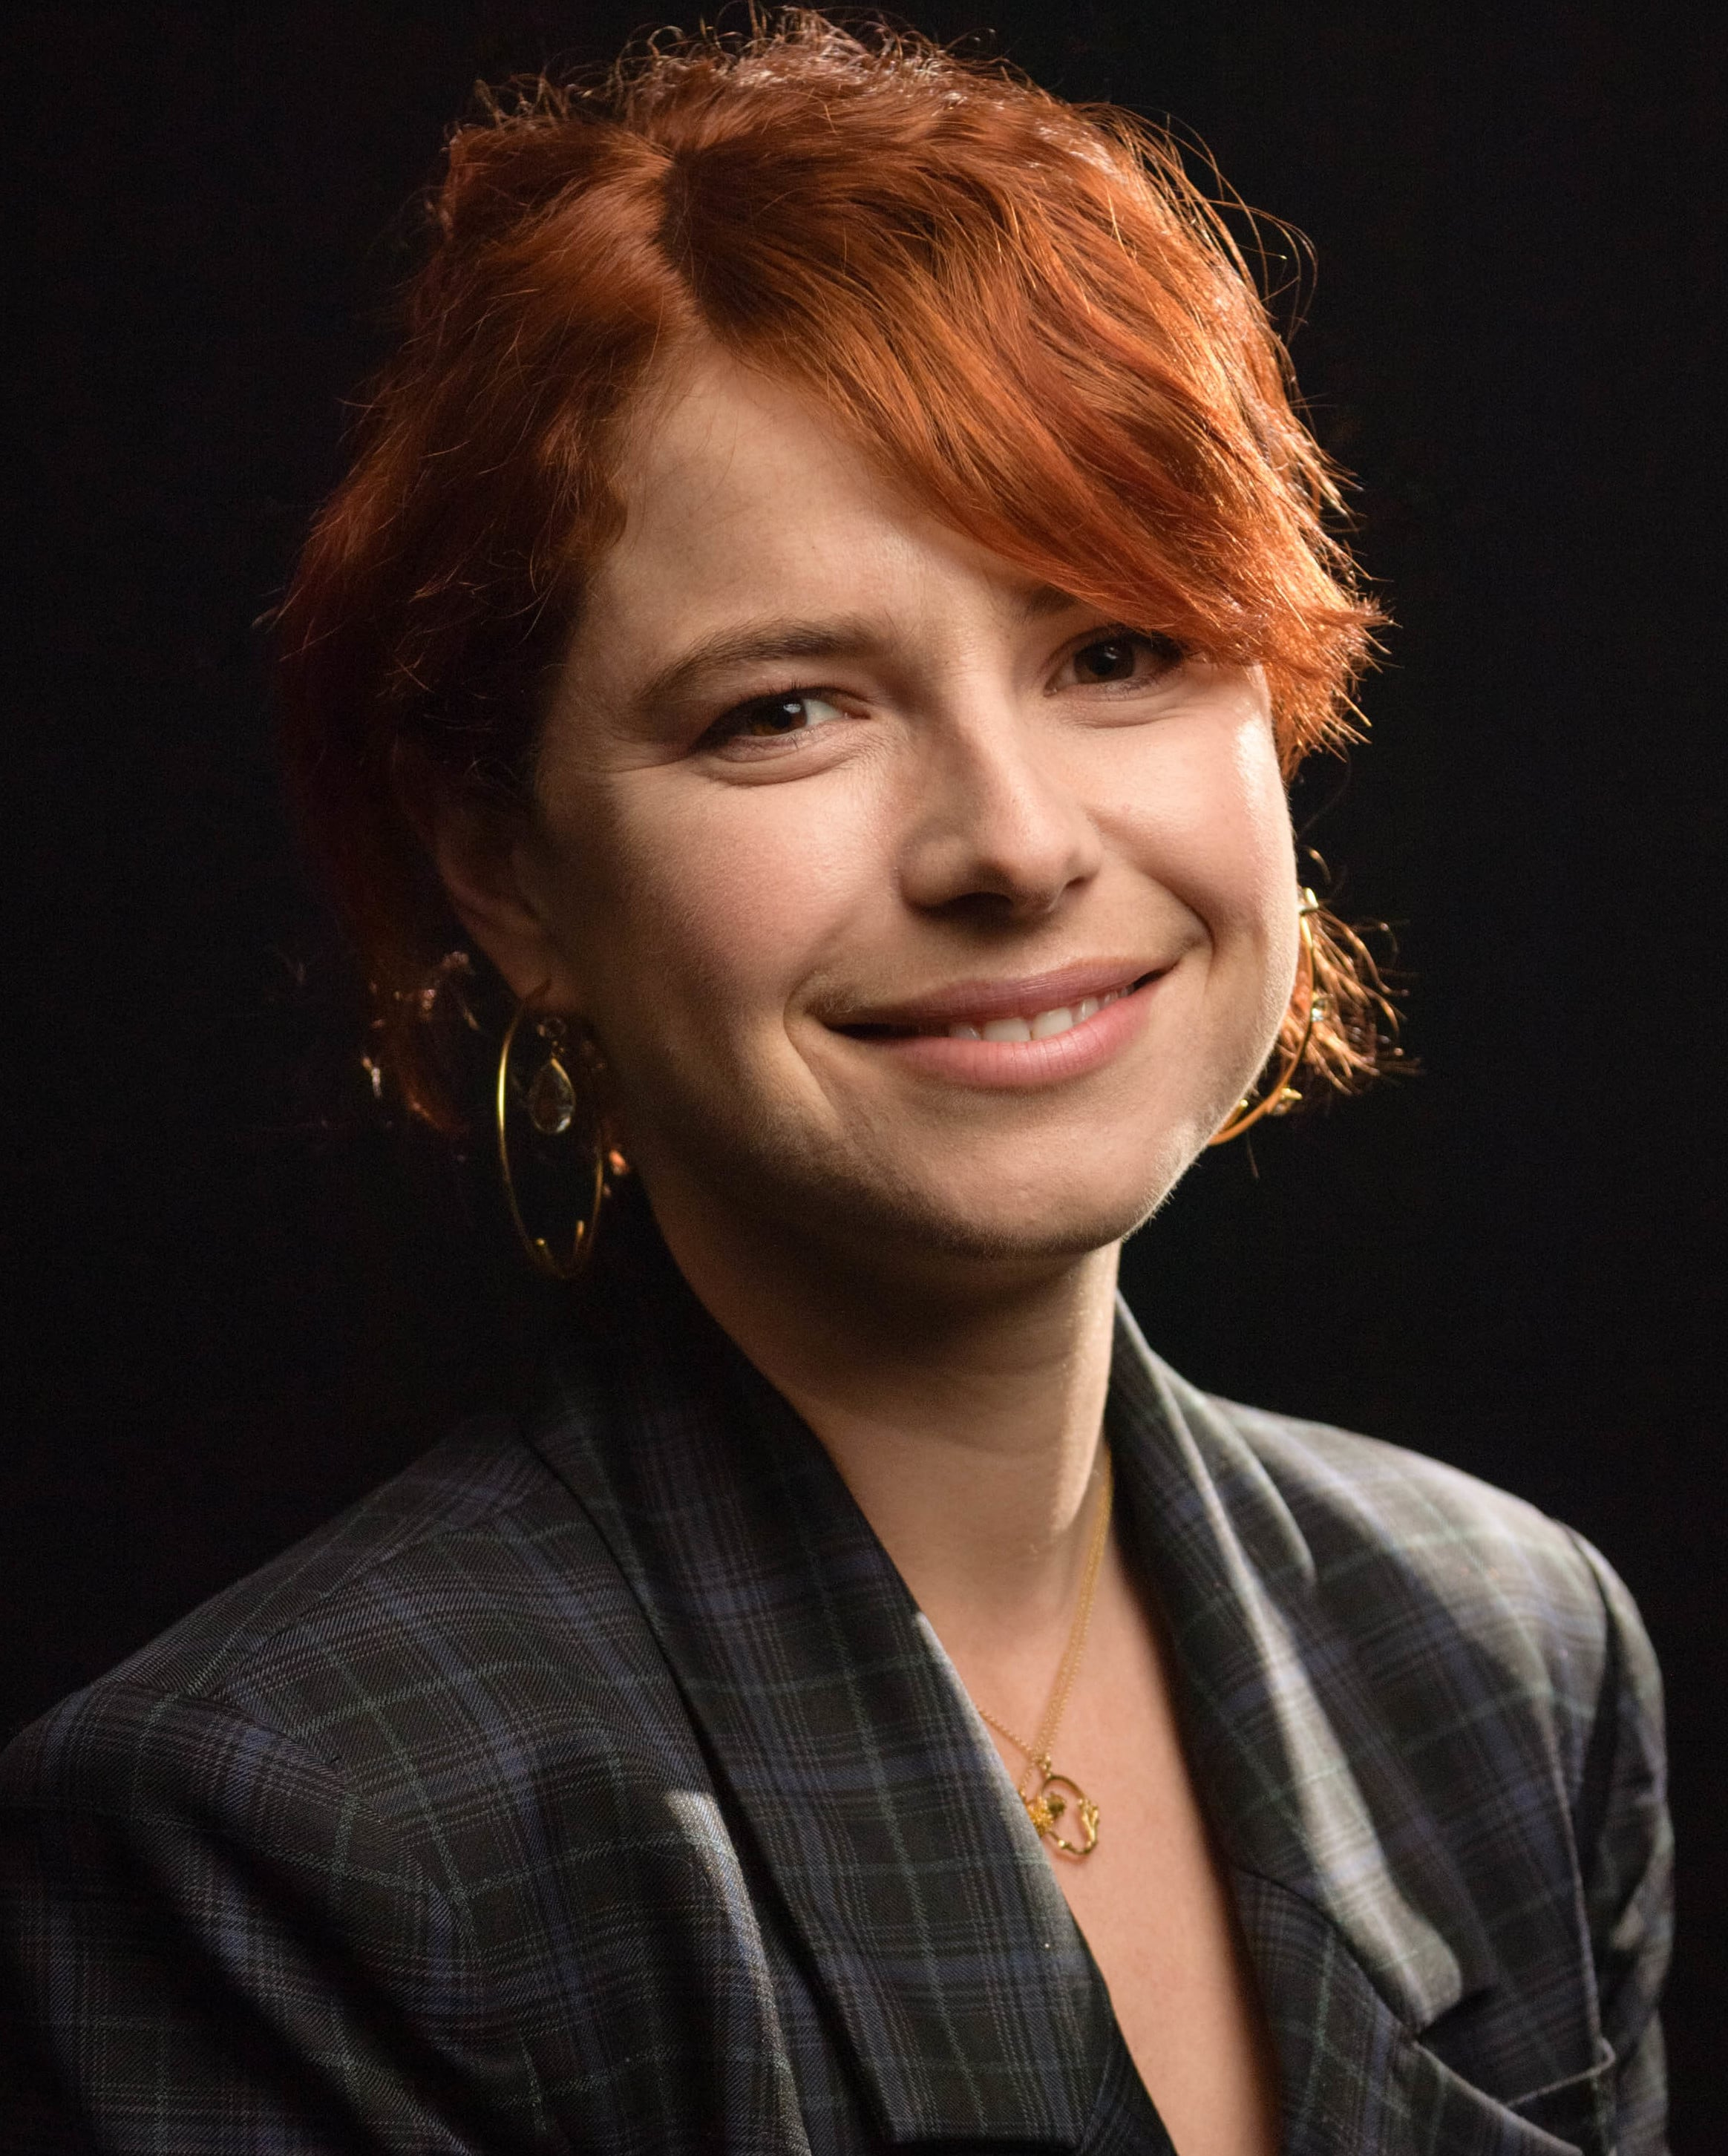 Jessie Buckley Irish Singer, Actress